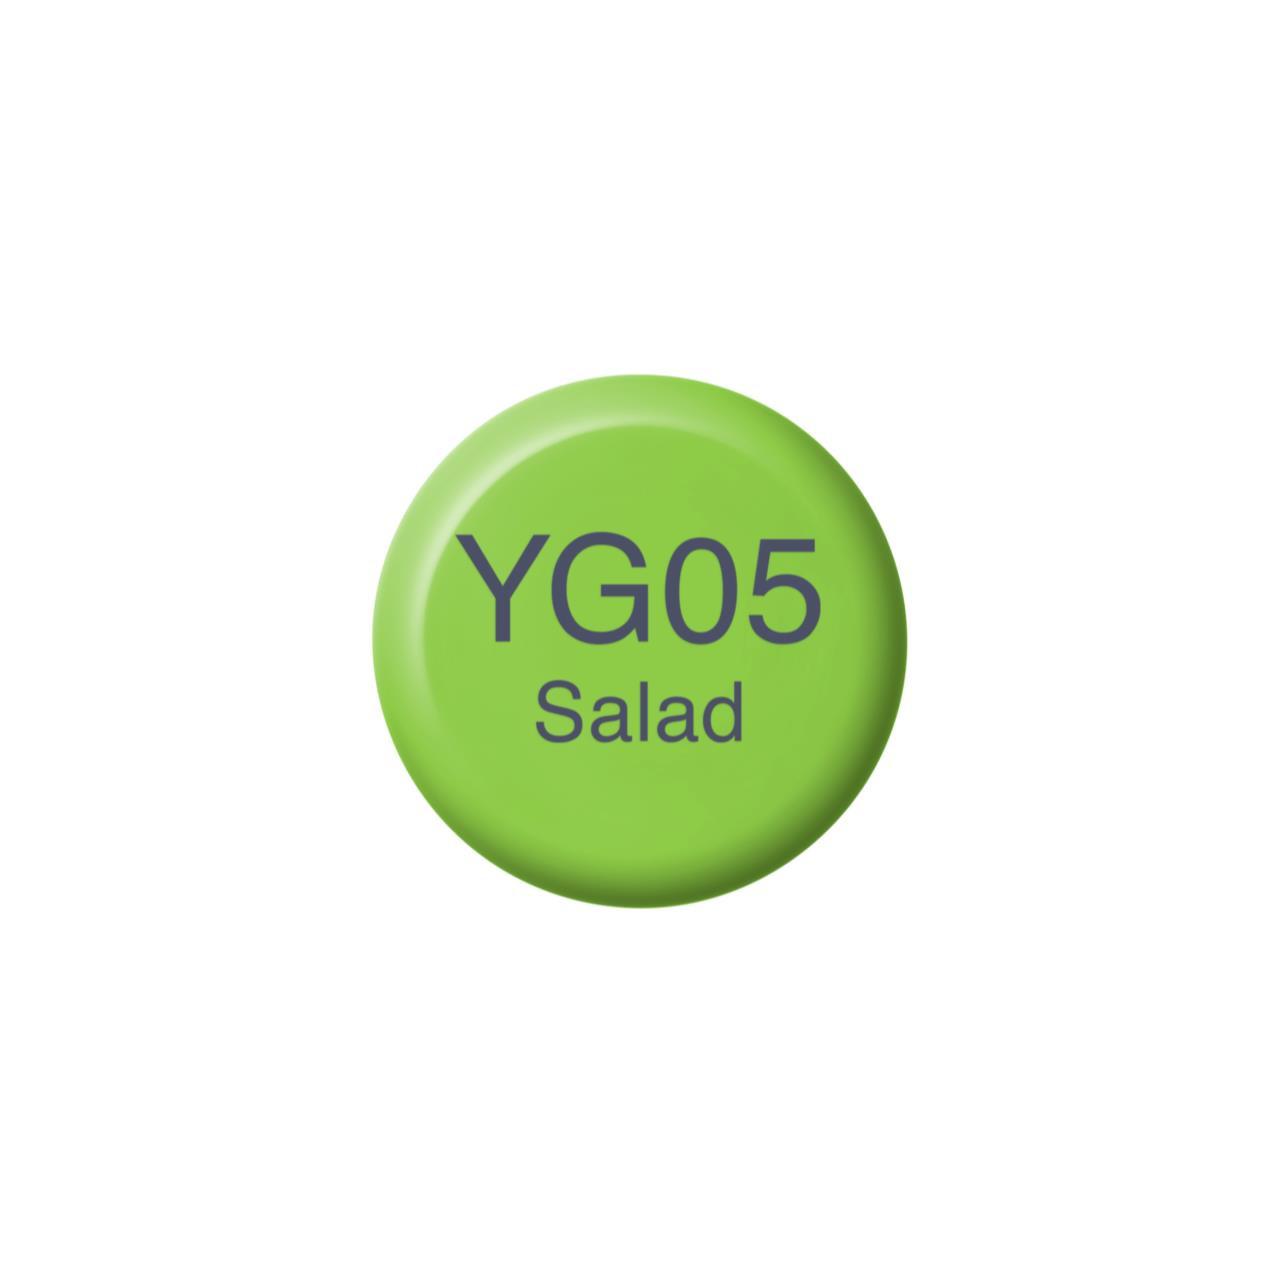 YG05 Salad, Copic Ink - 4511338058374